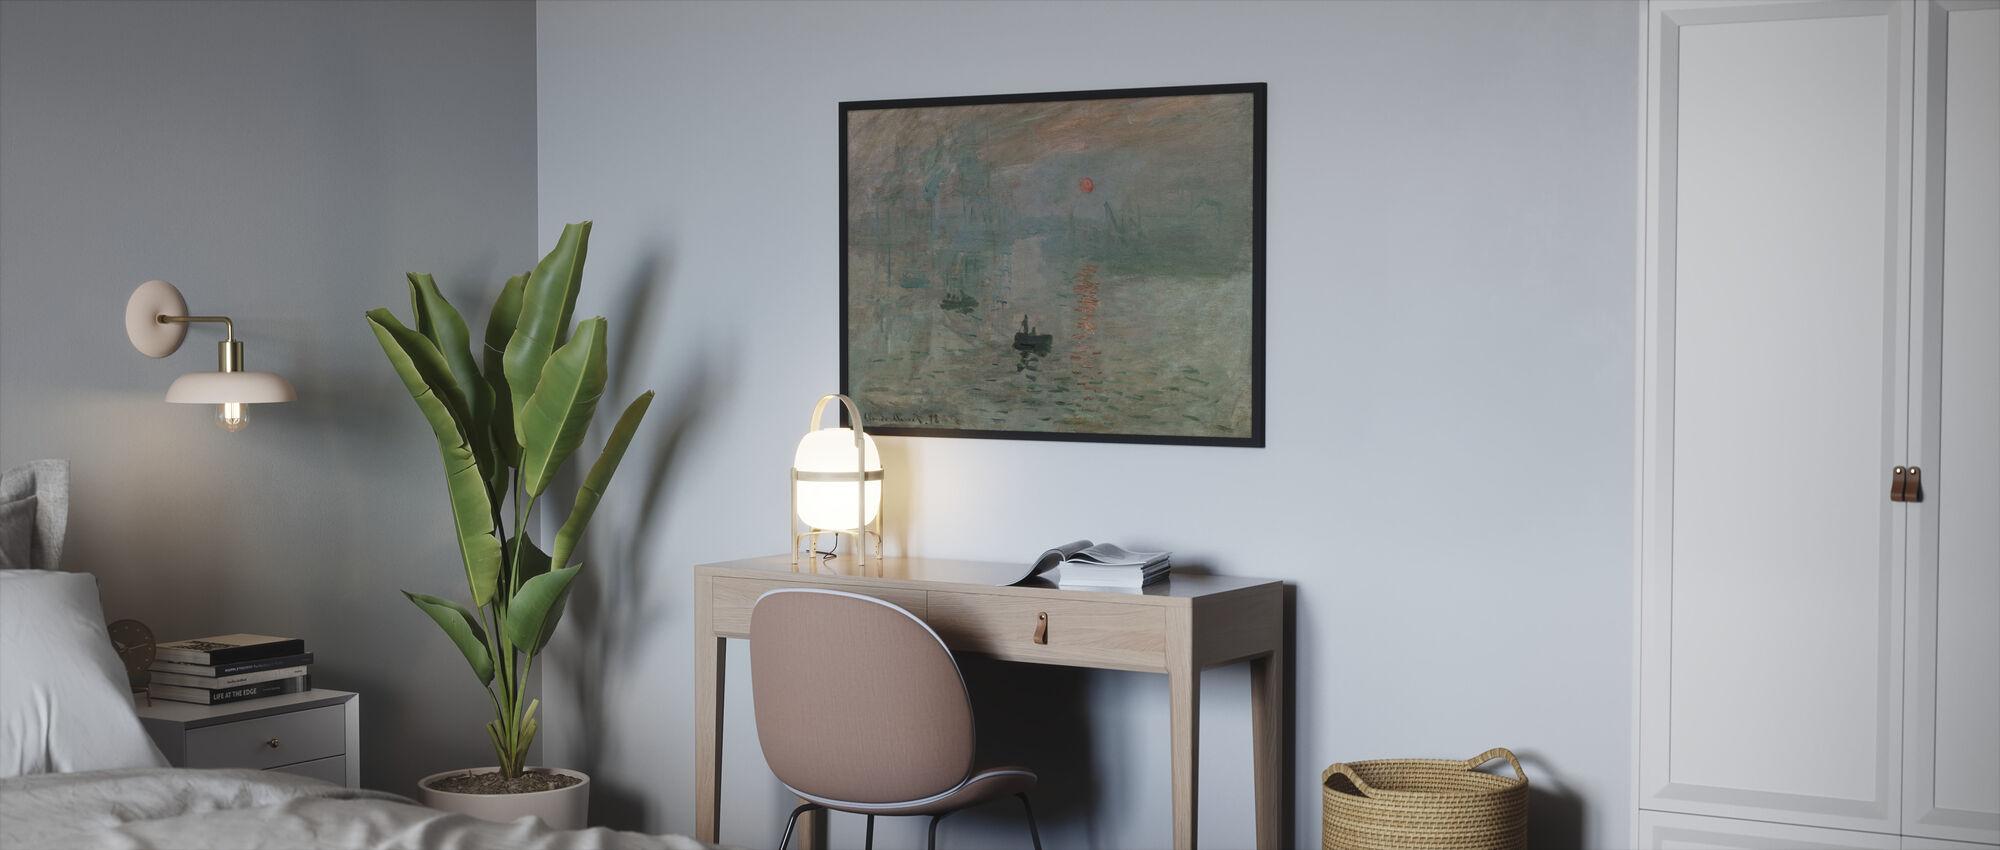 Monet, Claud - Impression - Kehystetty kuva - Makuuhuone